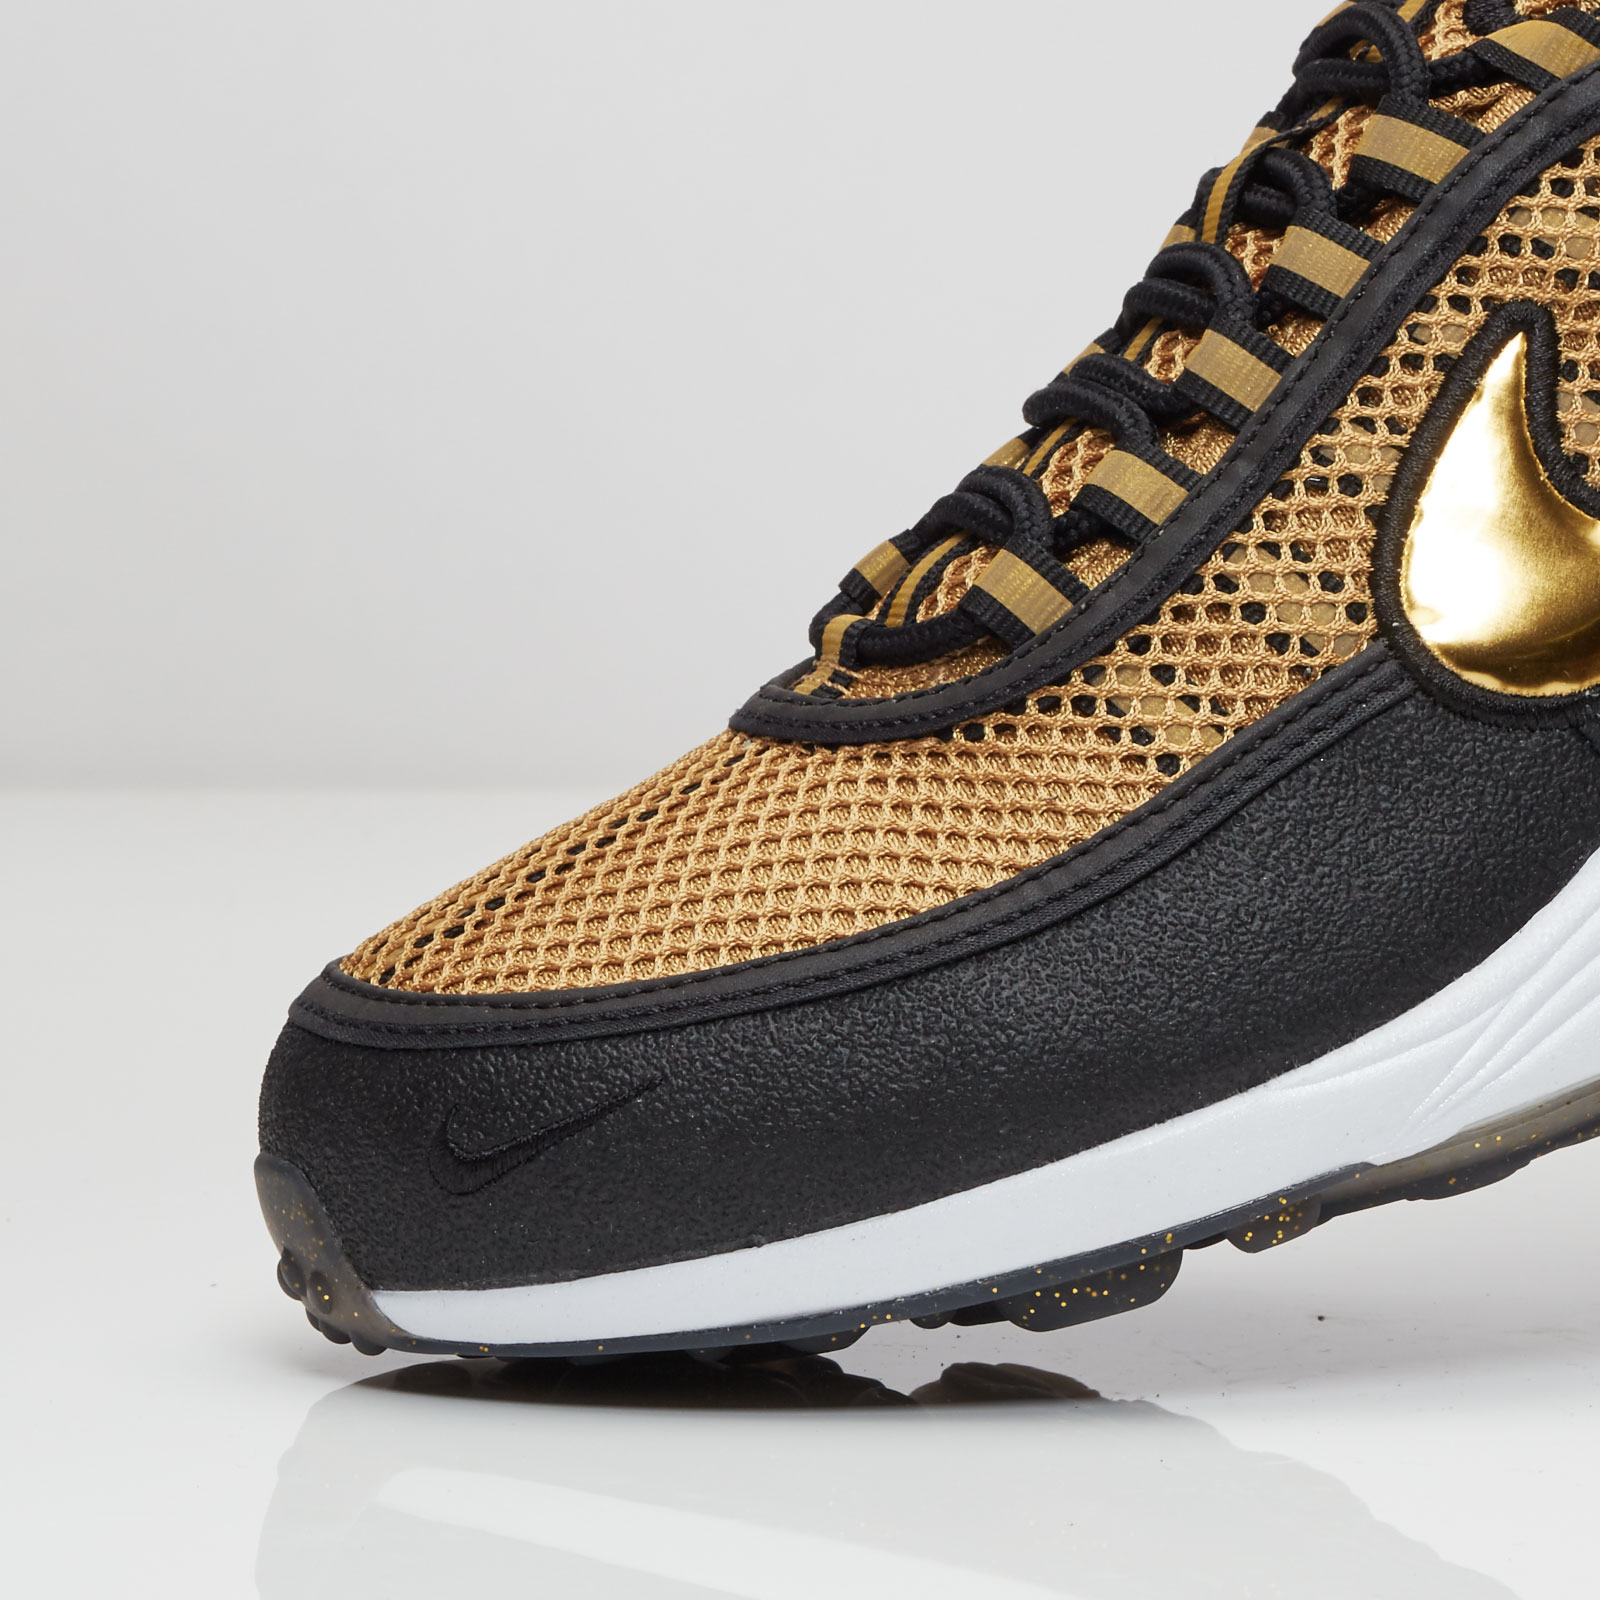 new arrival cc905 0b494 Nike Air Zoom Spiridon - 849776-770 - Sneakersnstuff | sneakers &  streetwear online since 1999